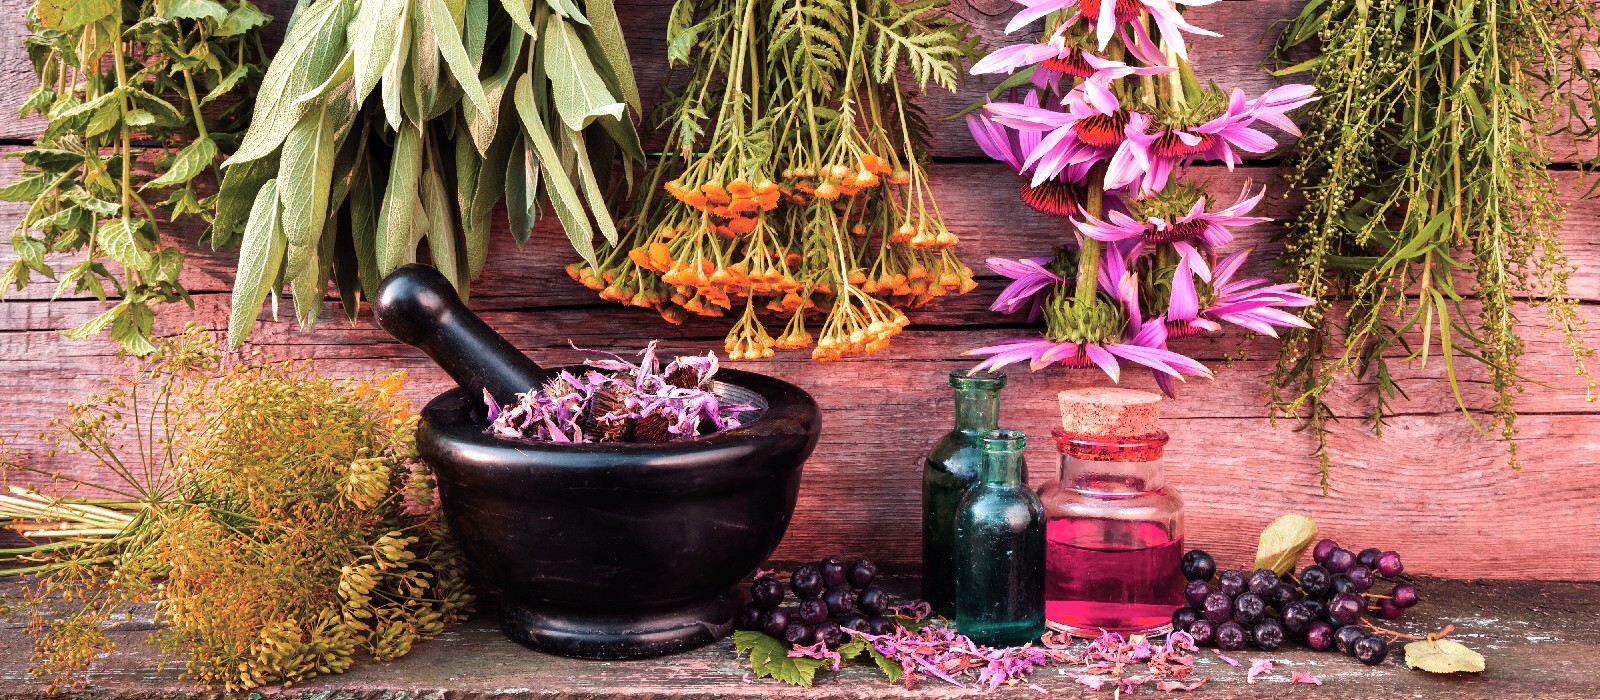 herbal medicine traditions Alquimia